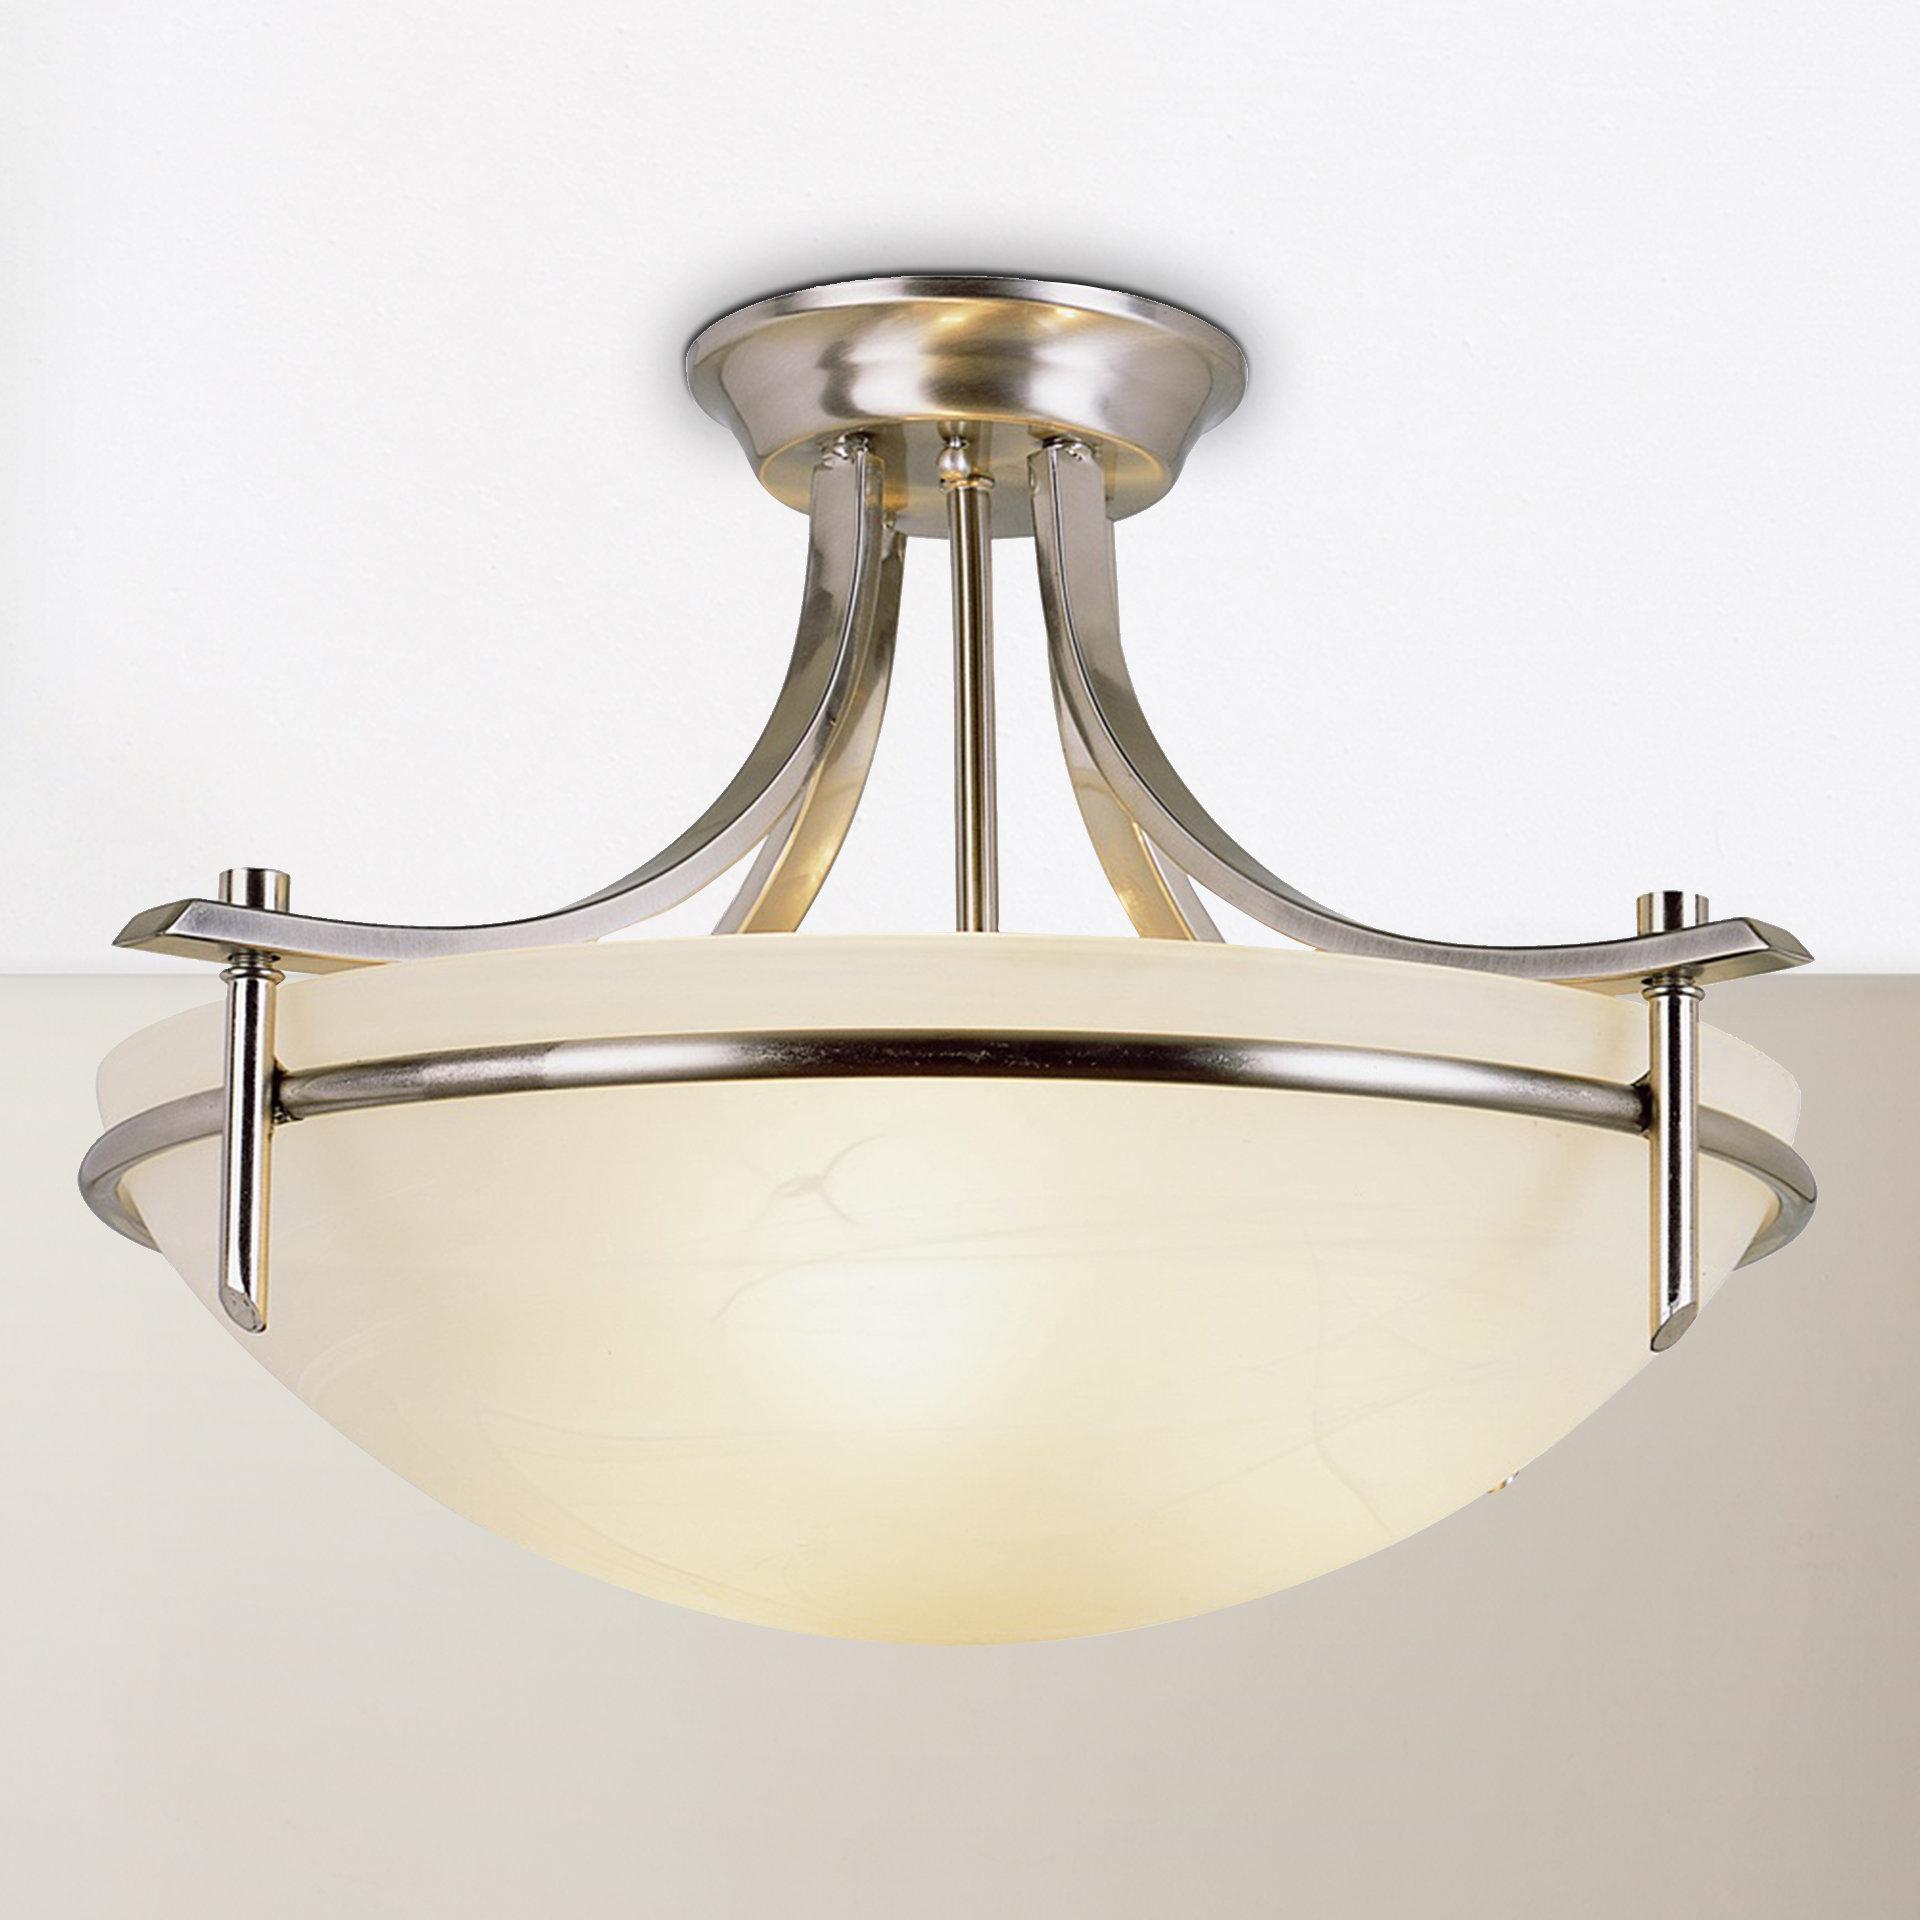 Newent 3-Light Single Bowl Pendants with Most Current Ferrante 3-Light Semi Flush Mount